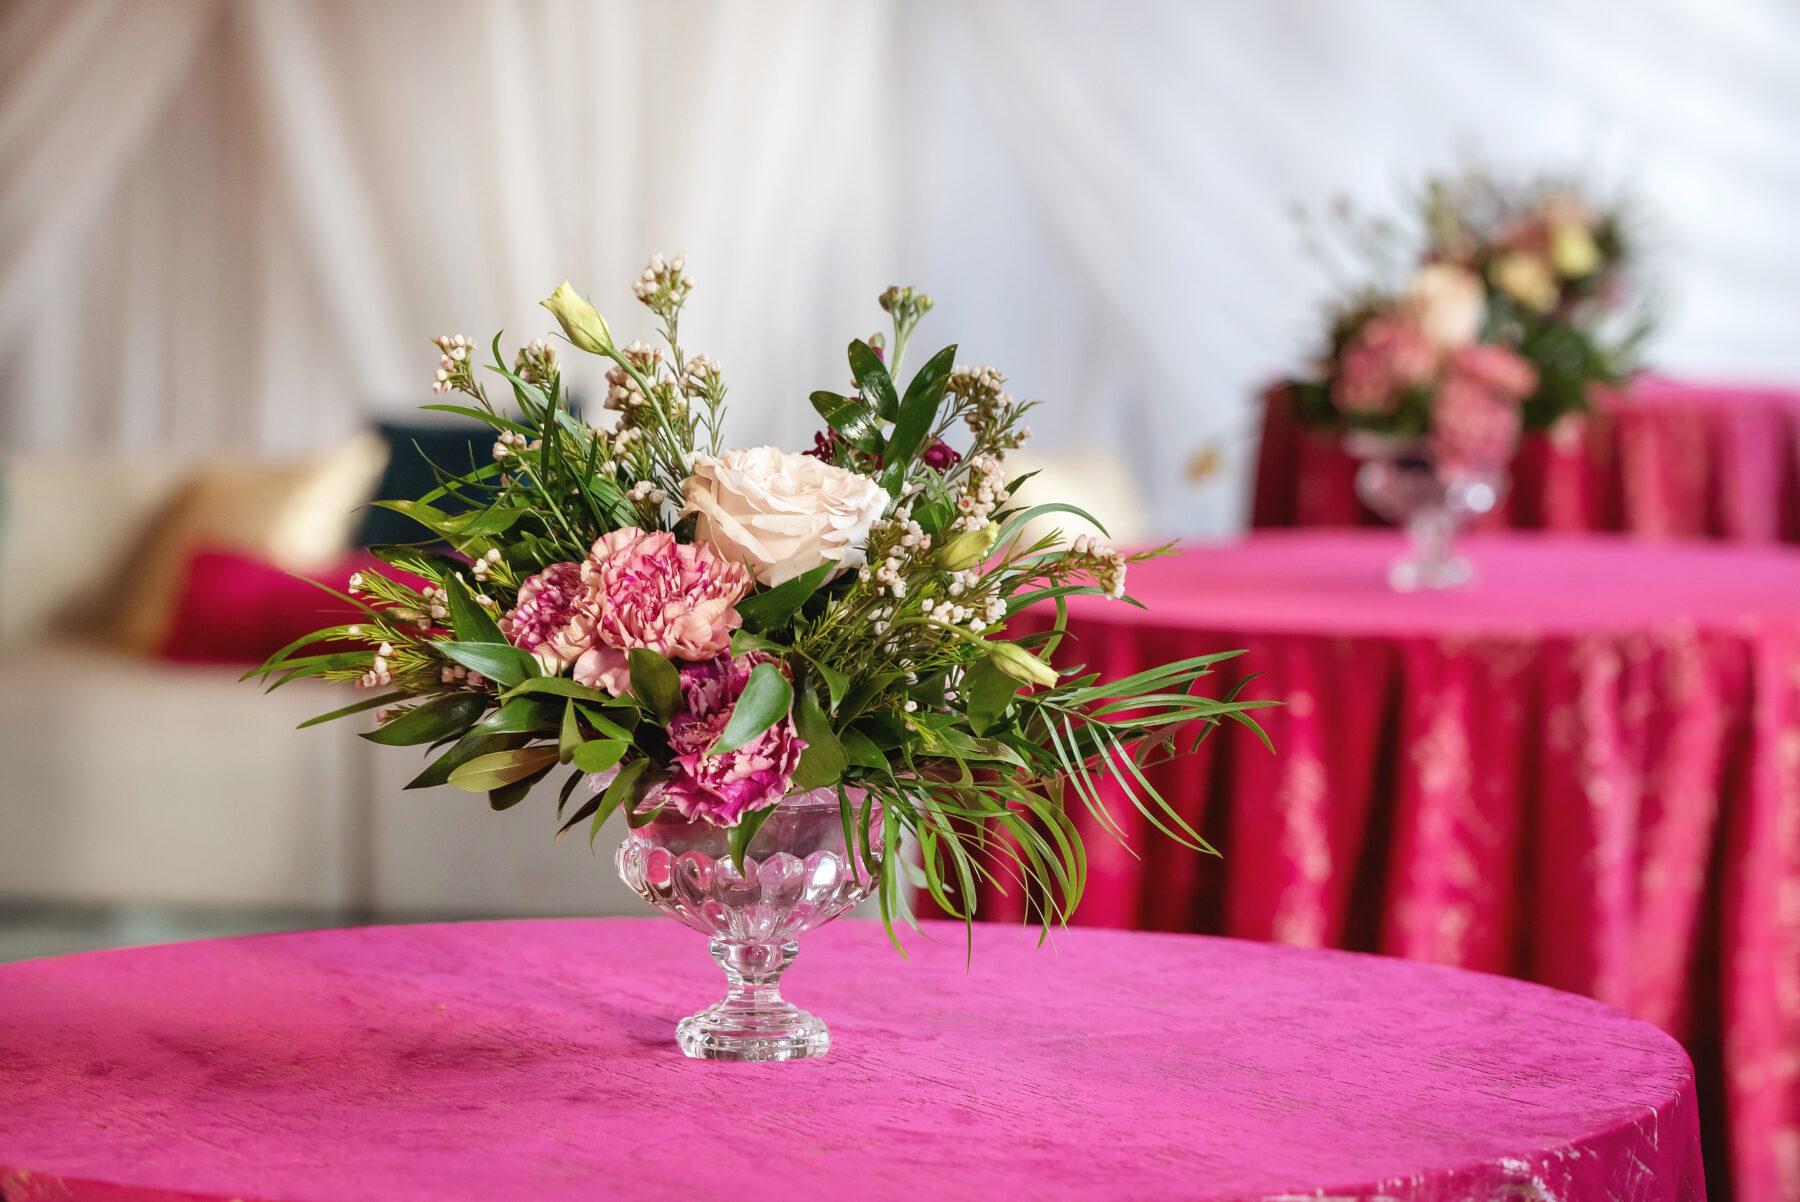 Spring Styled Shoot at Barn at Sycamore Farms | Nashville Bride Guide